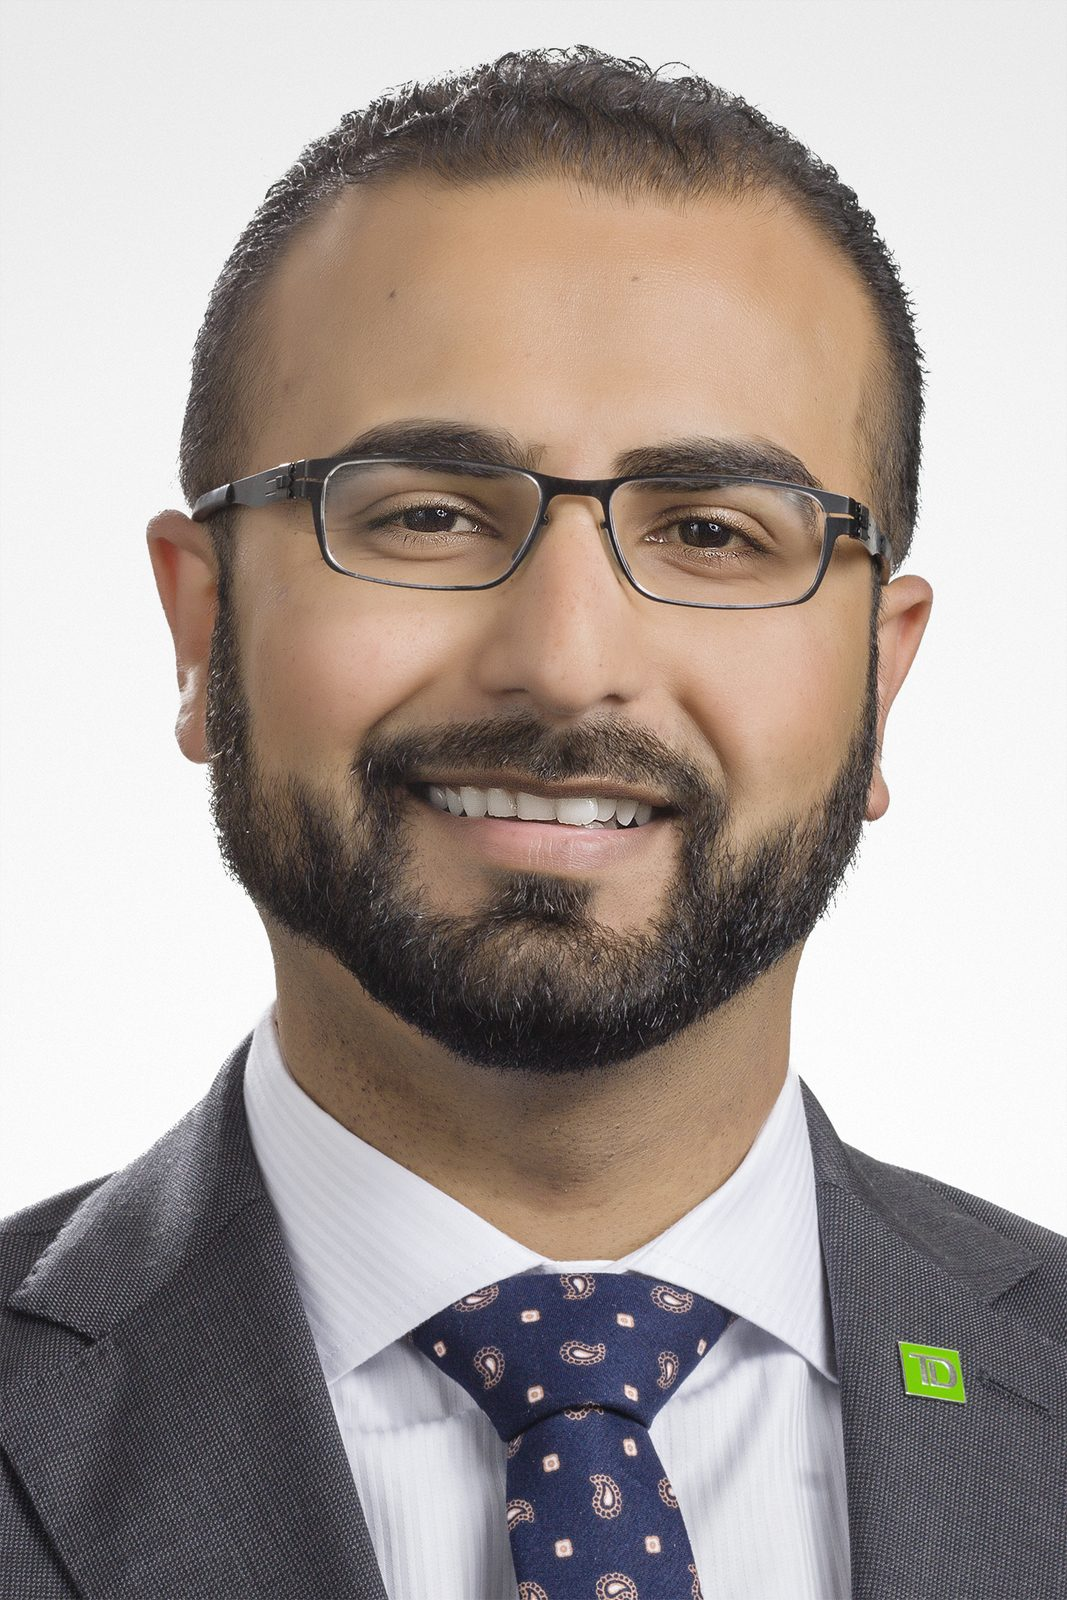 Ali Hemraj - TD Financial Planner in Downsview